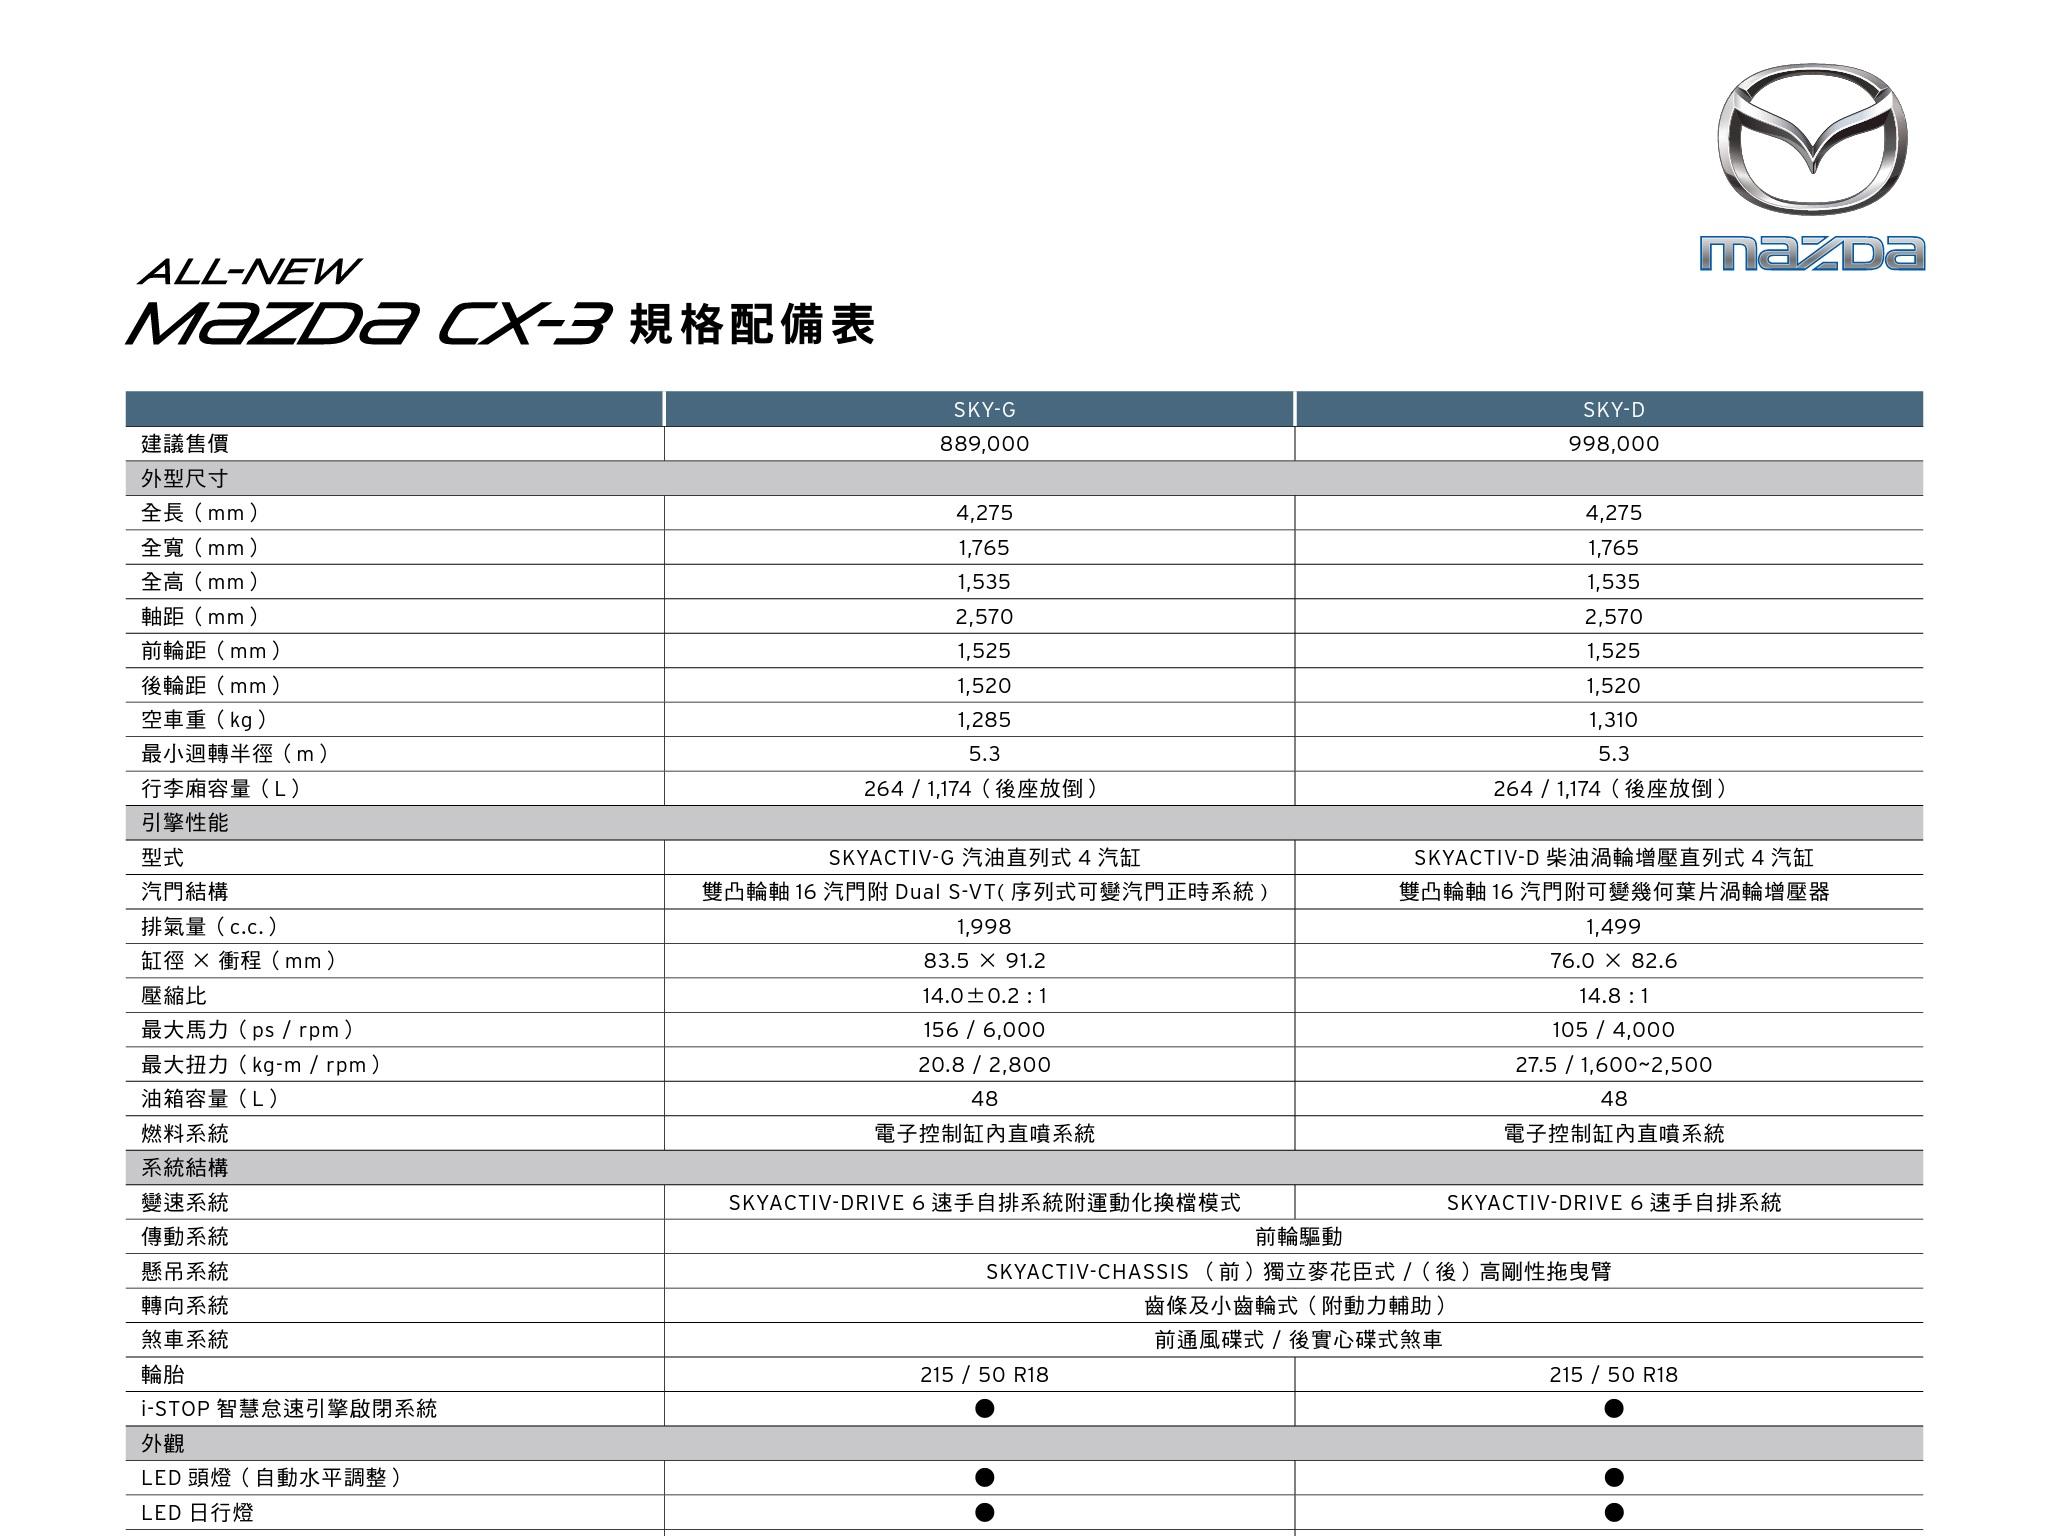 Mazda Cx 3 售價確定 1 5d 99 8 2 0g 88 9 汽車討論區 Mobile01